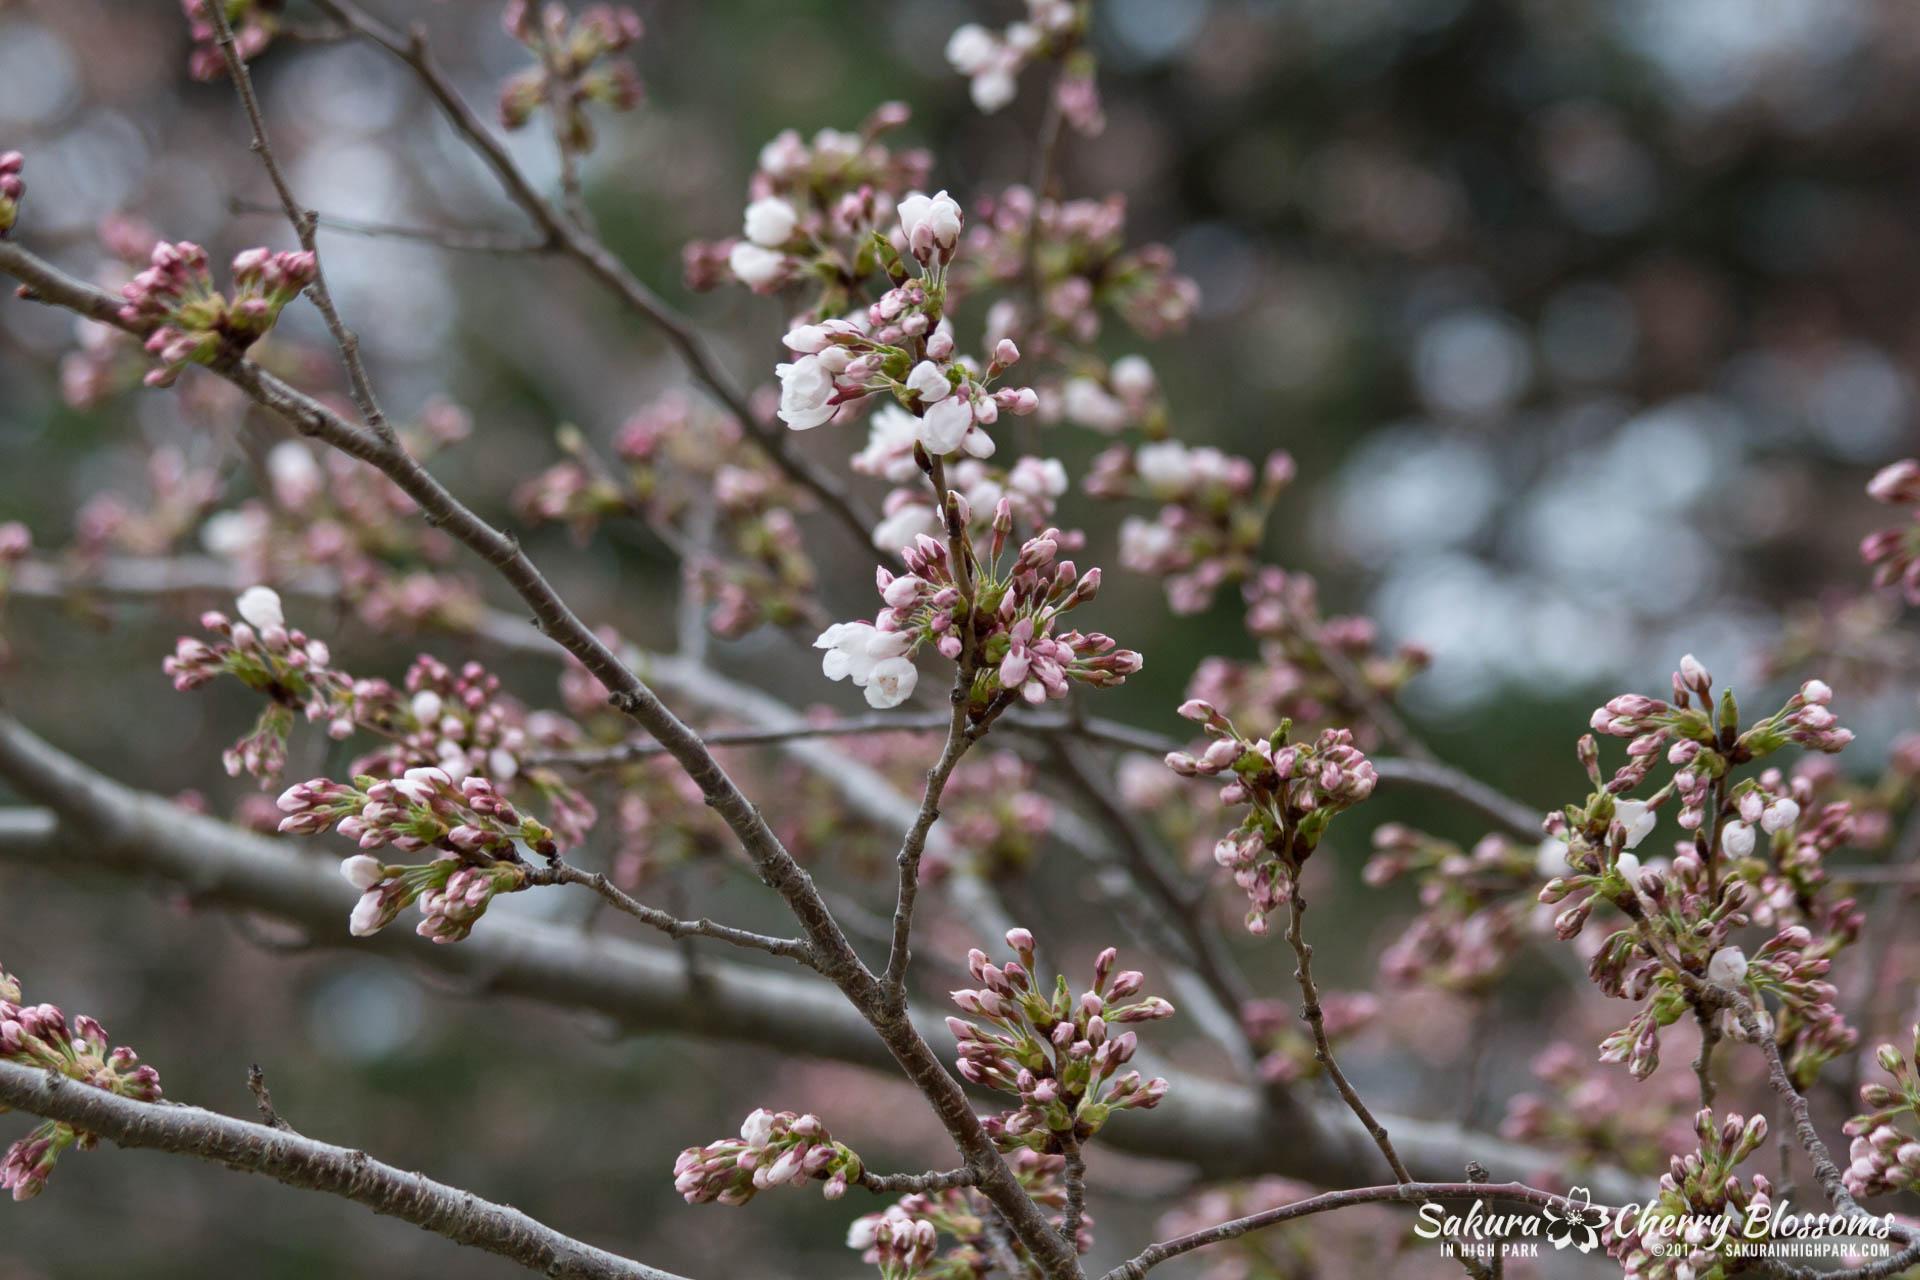 Sakura-Watch-April-21-2017-bloom-still-in-early-stages-47.jpg